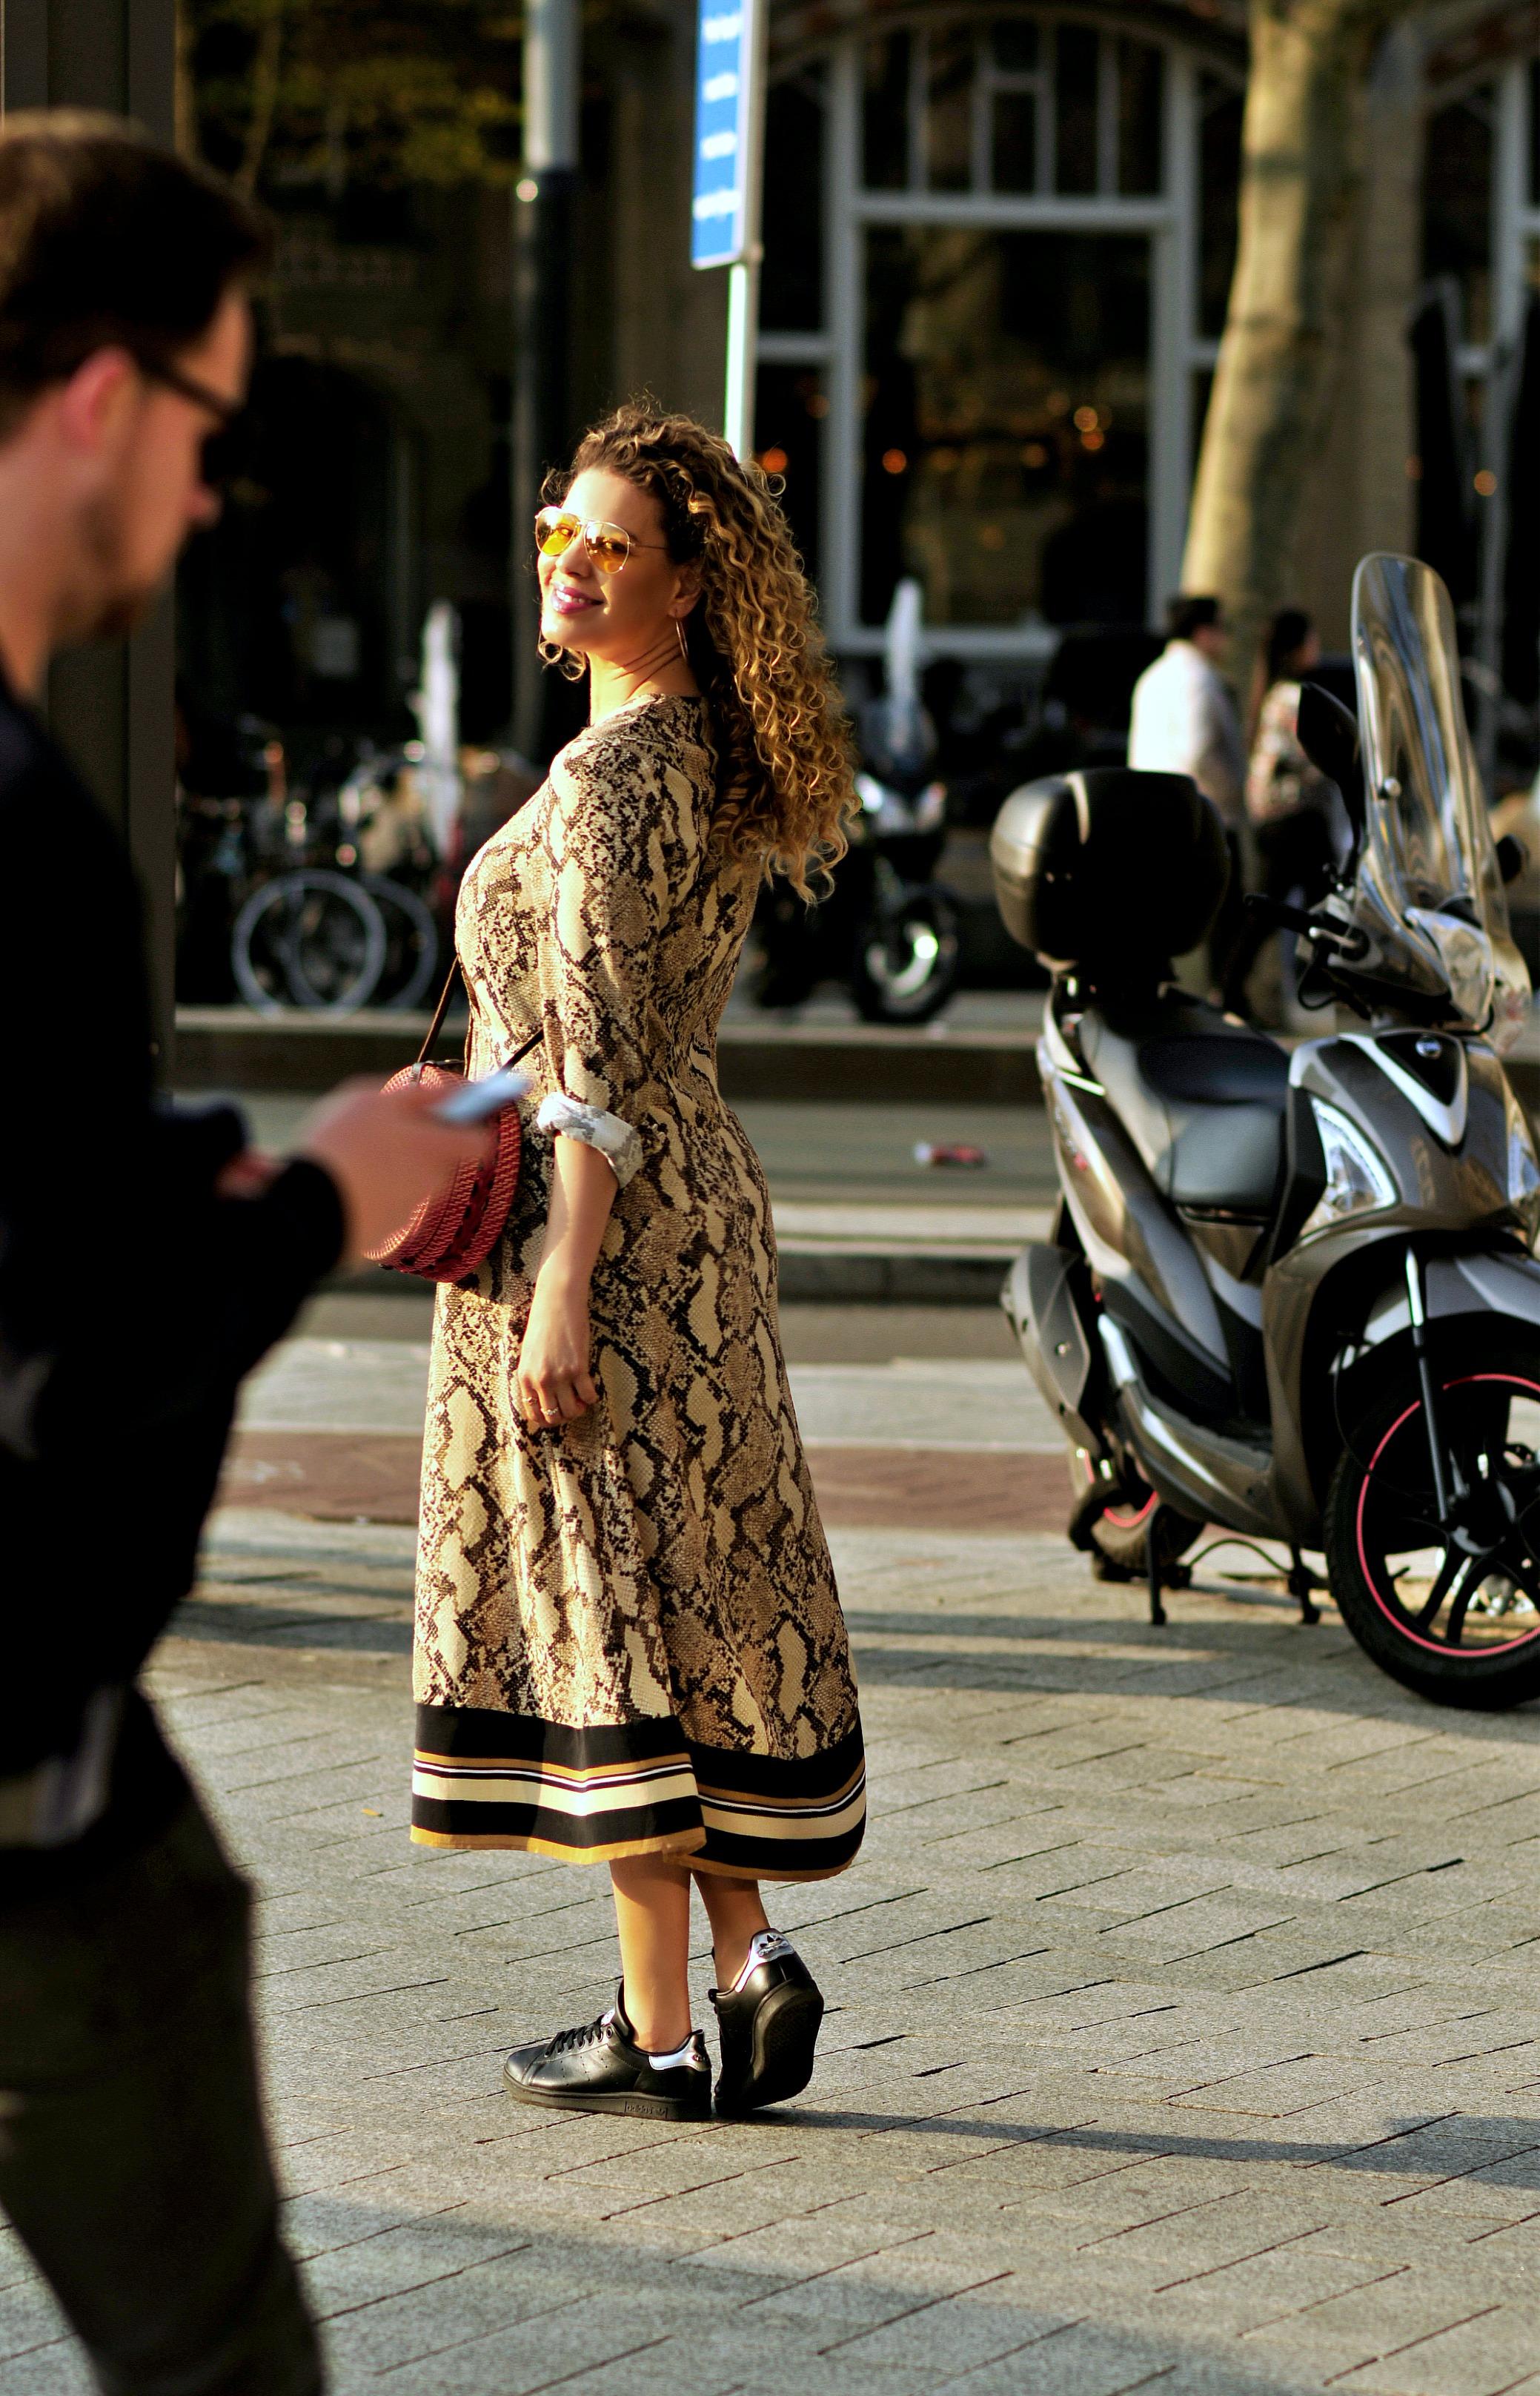 Seventies Style, Tamara Chloé7+1